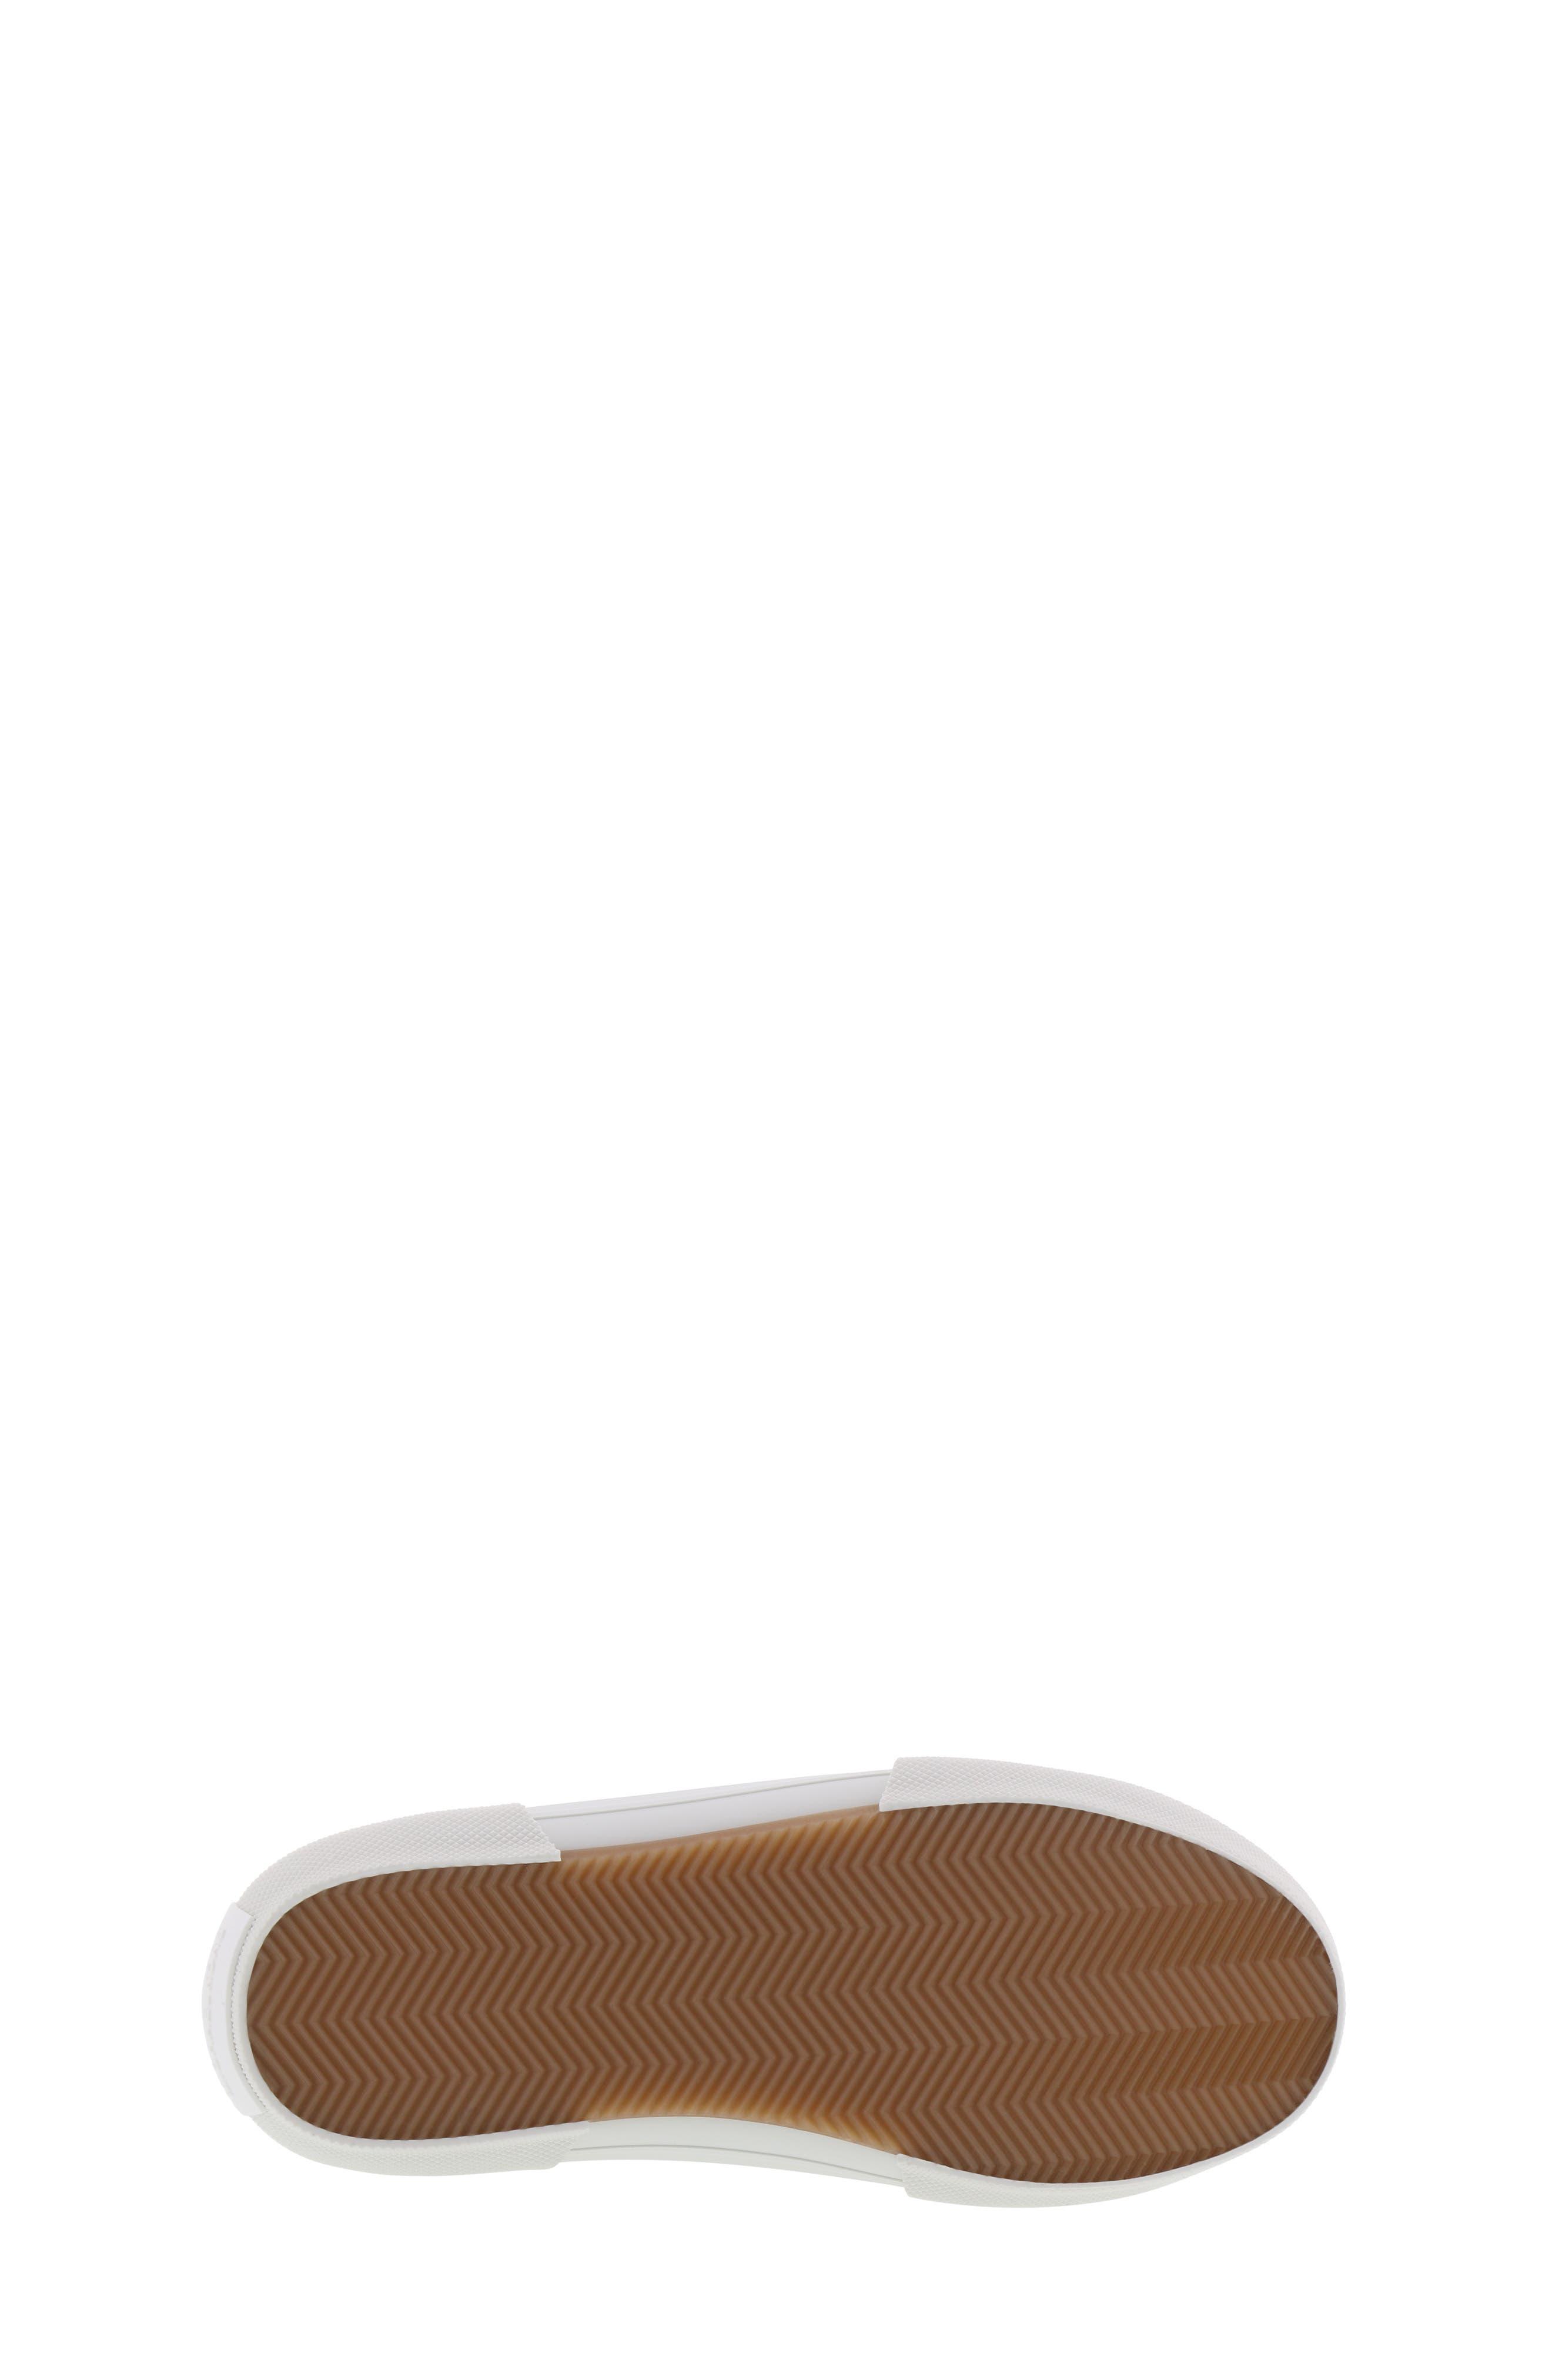 MICHAEL MICHAEL KORS, Ima Rebel Sneaker, Alternate thumbnail 6, color, VANILLA